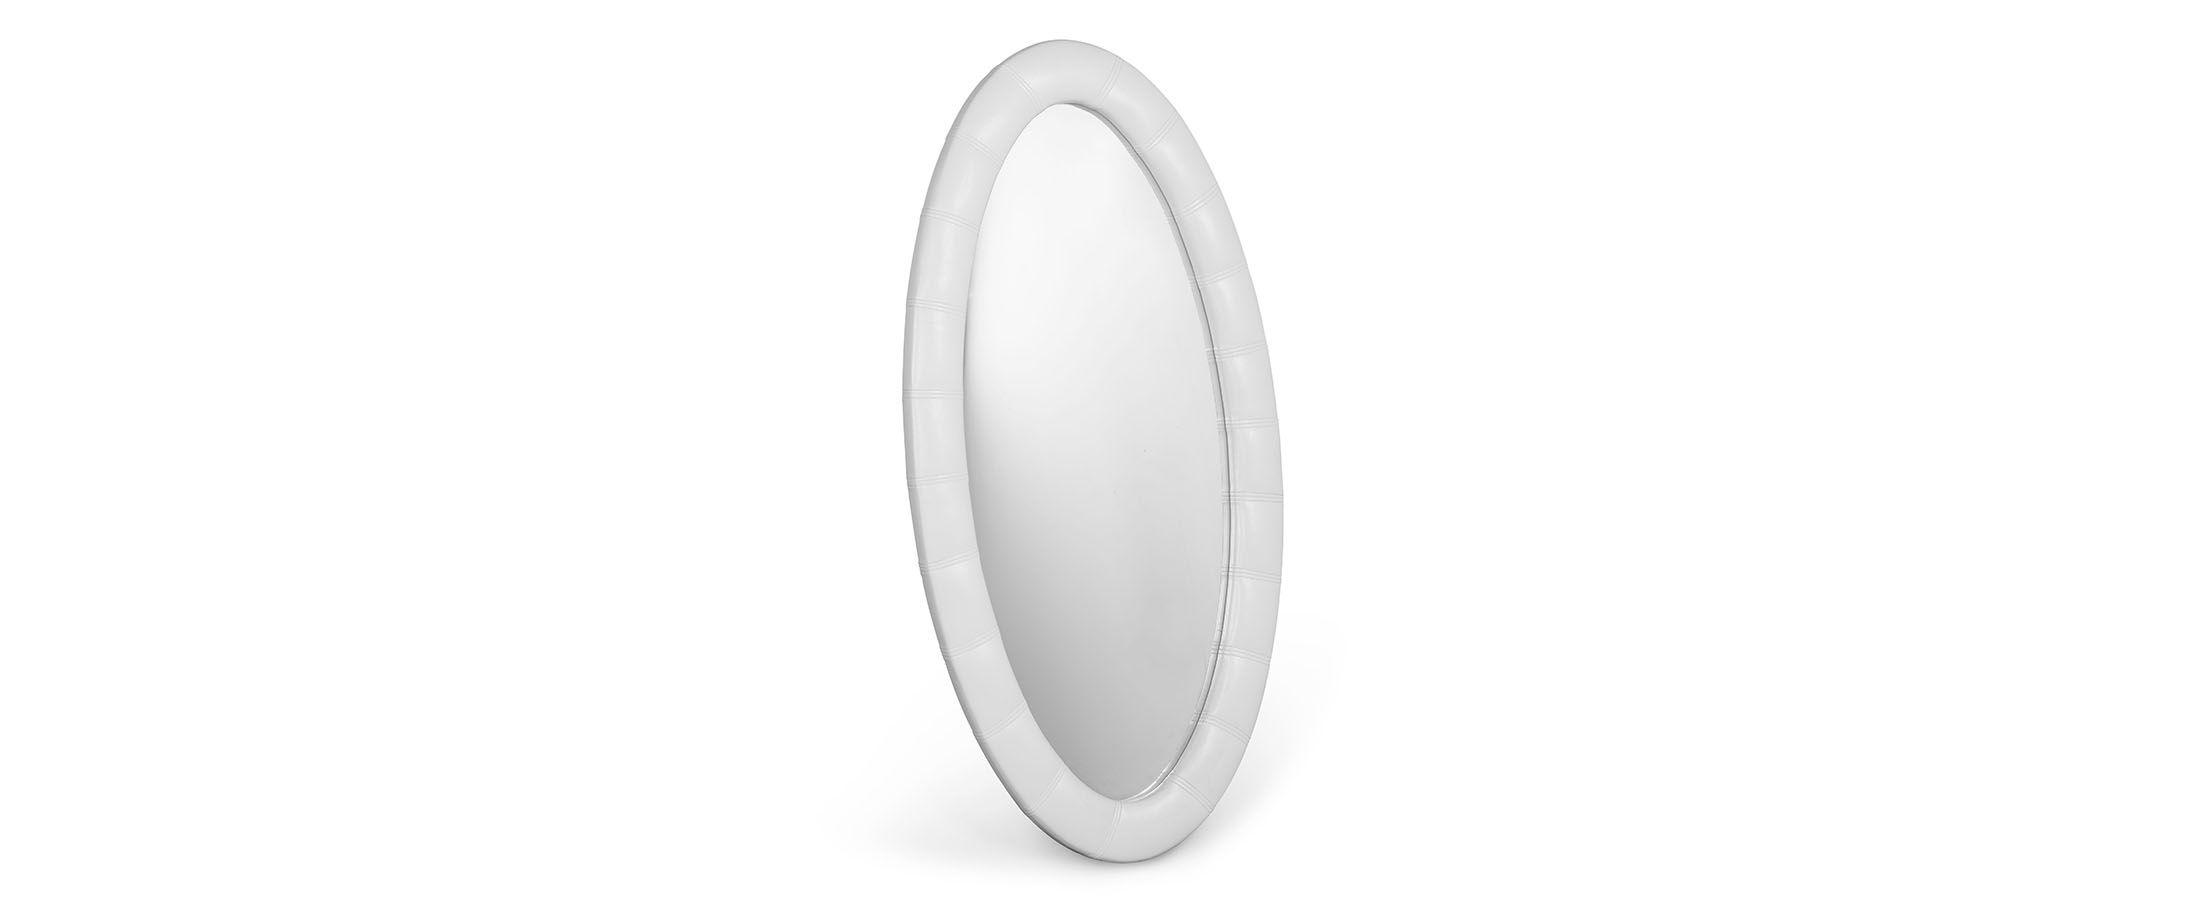 Зеркало Люнетта марципан от MOON TRADE